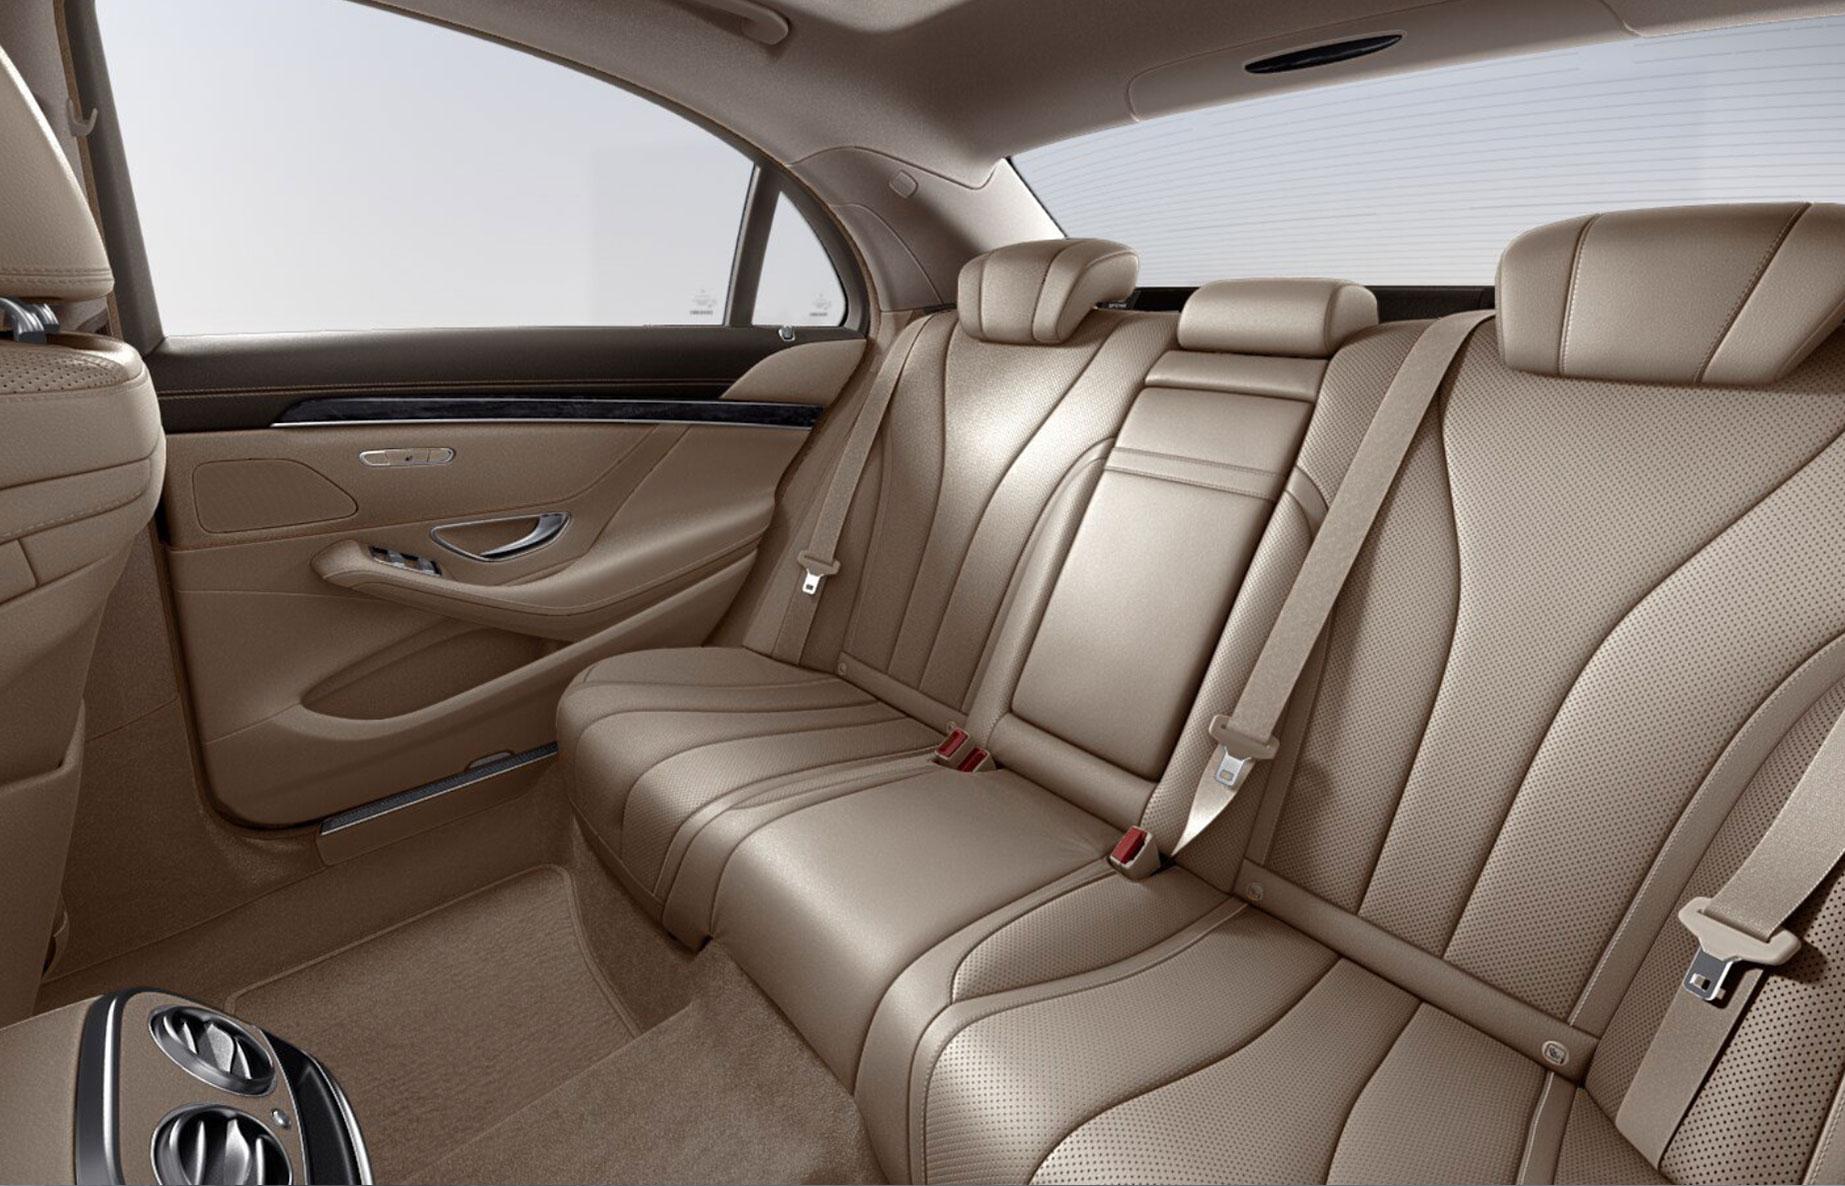 Executive Chauffeur Hire Milan - S Class Interior